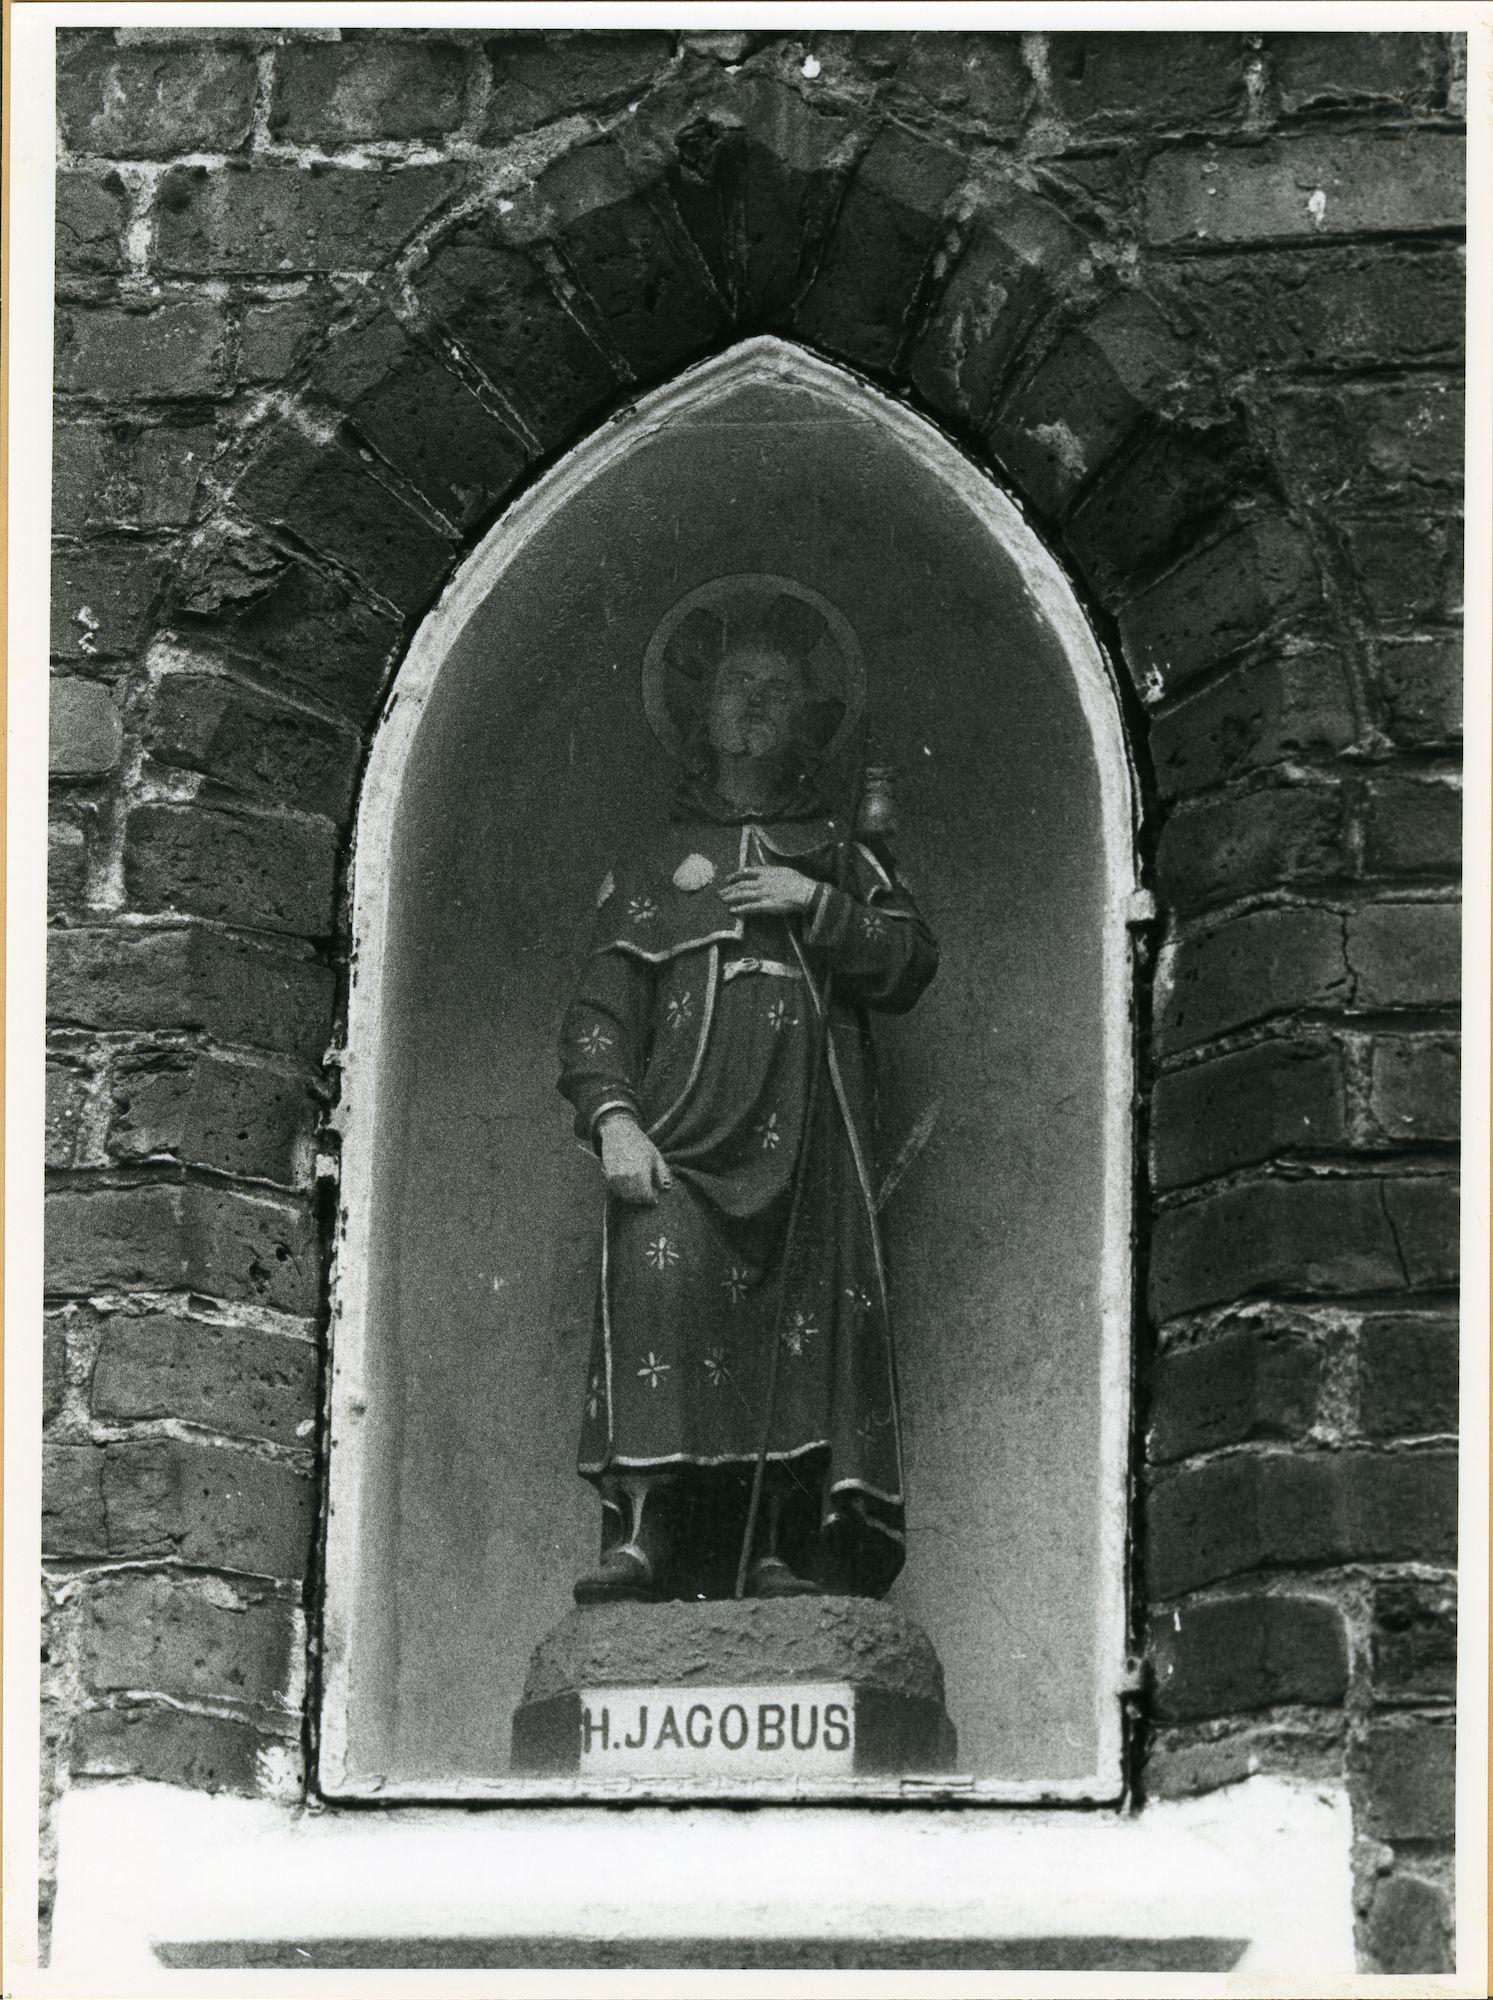 Sint-Amandsberg: Sint-Baafstraat 27: Niskapel